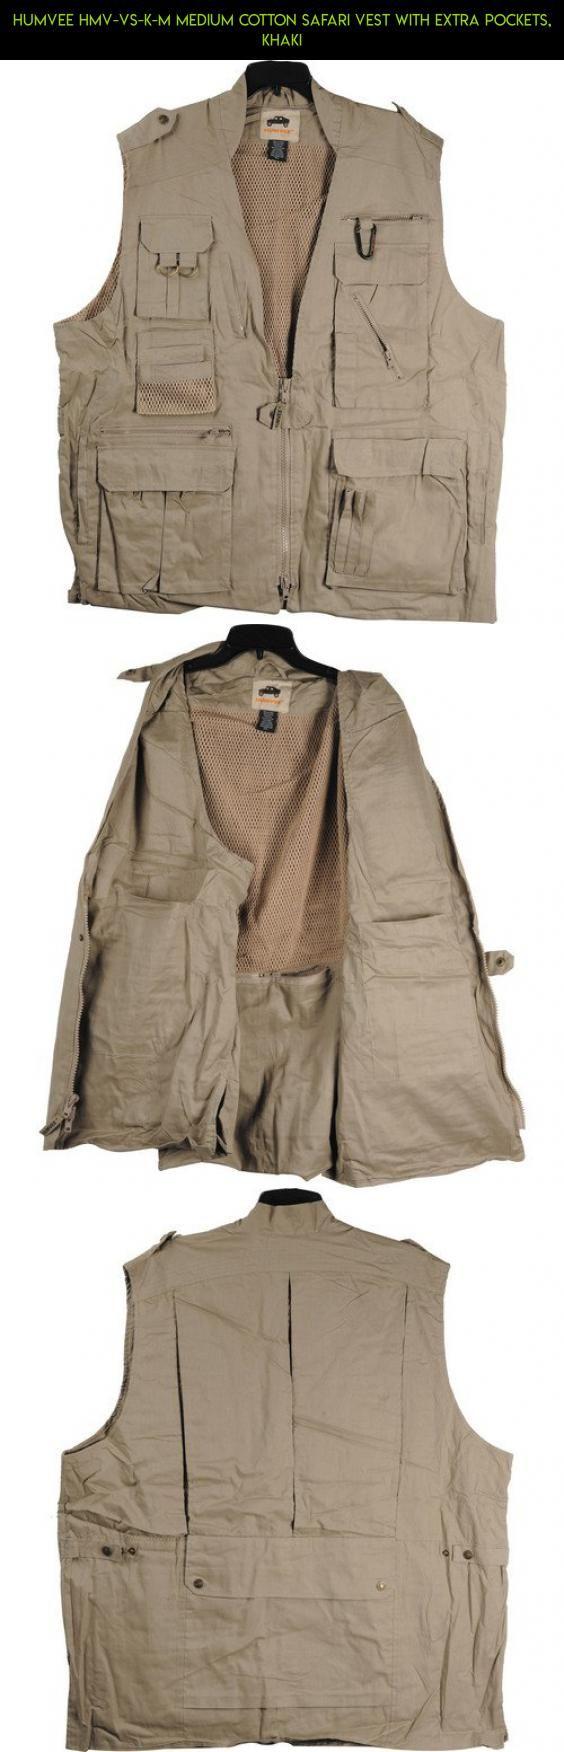 best 25 safari vest ideas on pinterest safari theme jungle